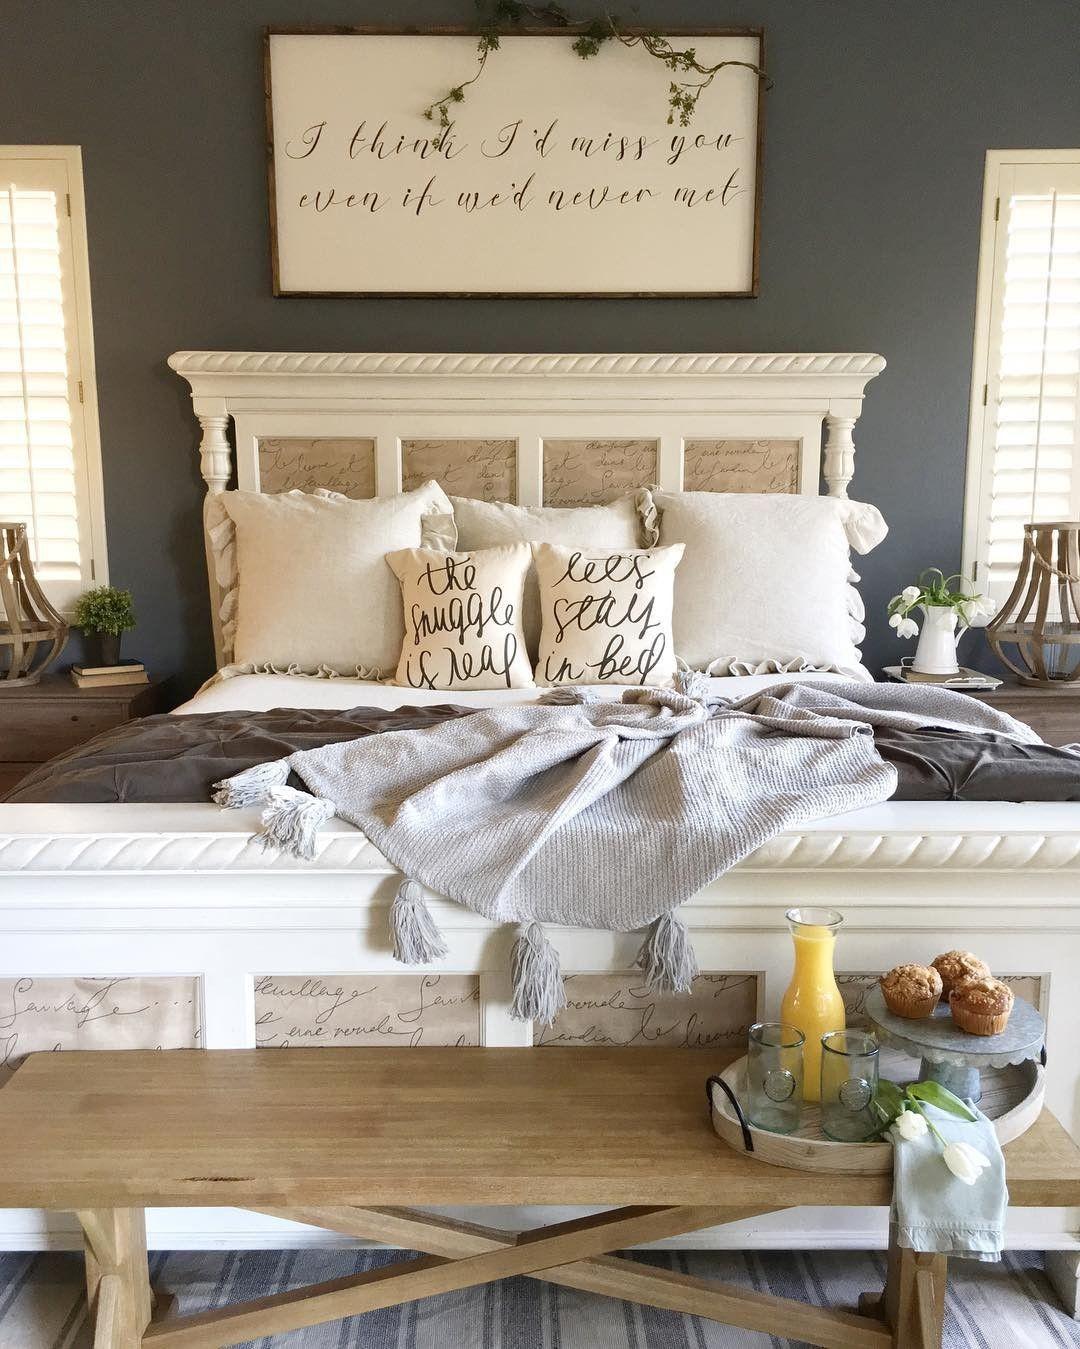 52 Rustic Farmhouse Bedroom Decorating Ideas